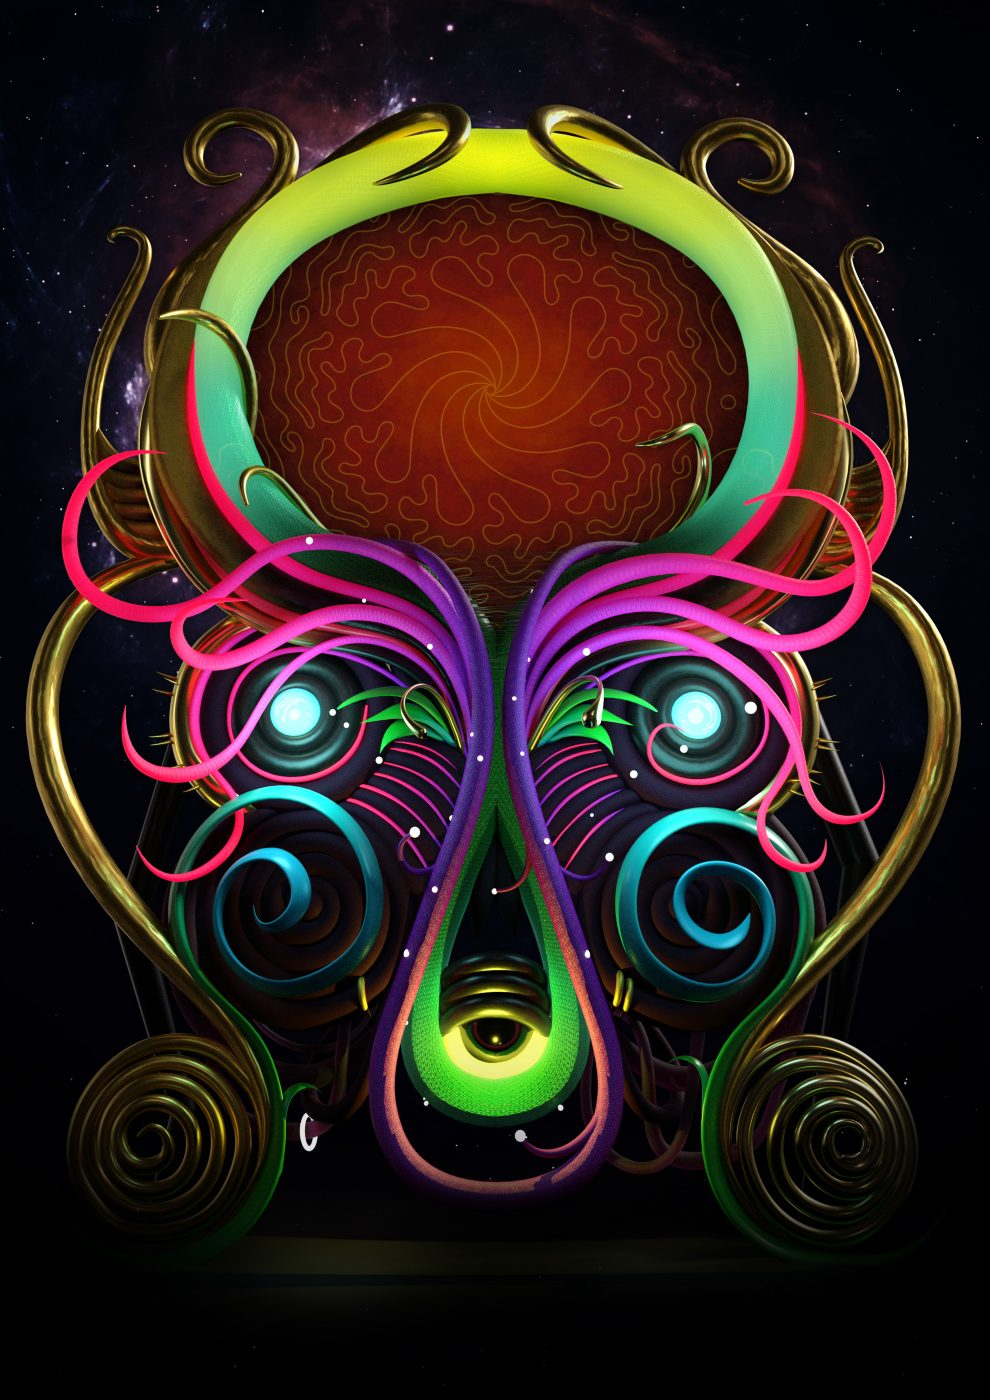 Image of visual art by Metageist